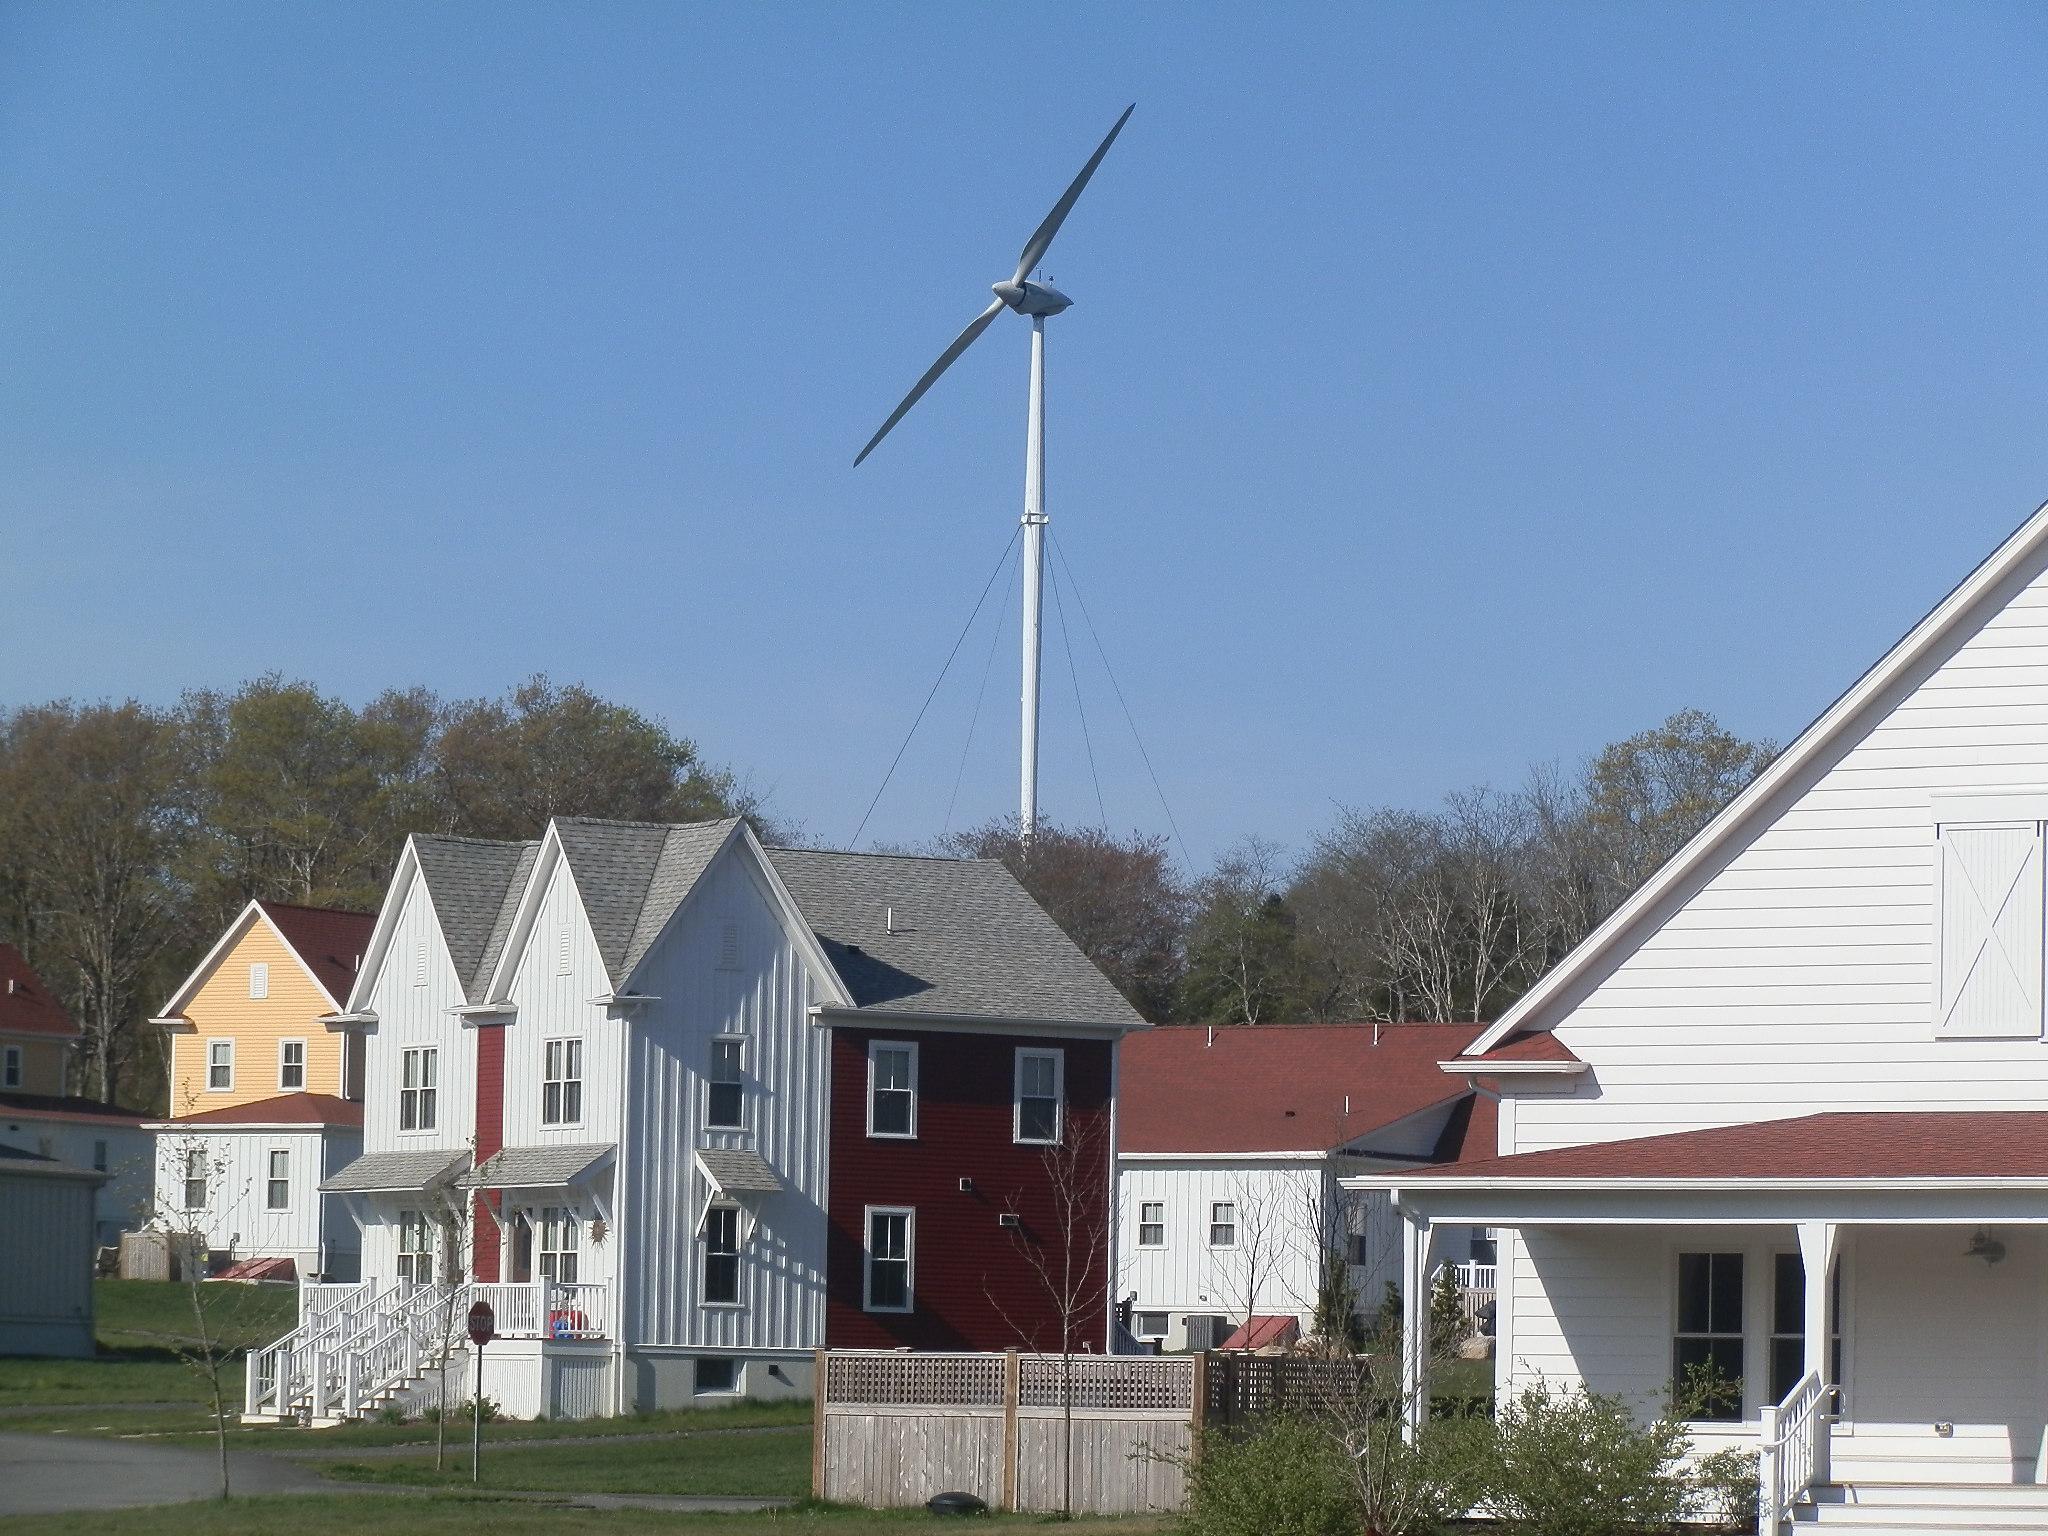 April 26, 2012 - US-Sandywoods-215. (Photo from Vergnet)